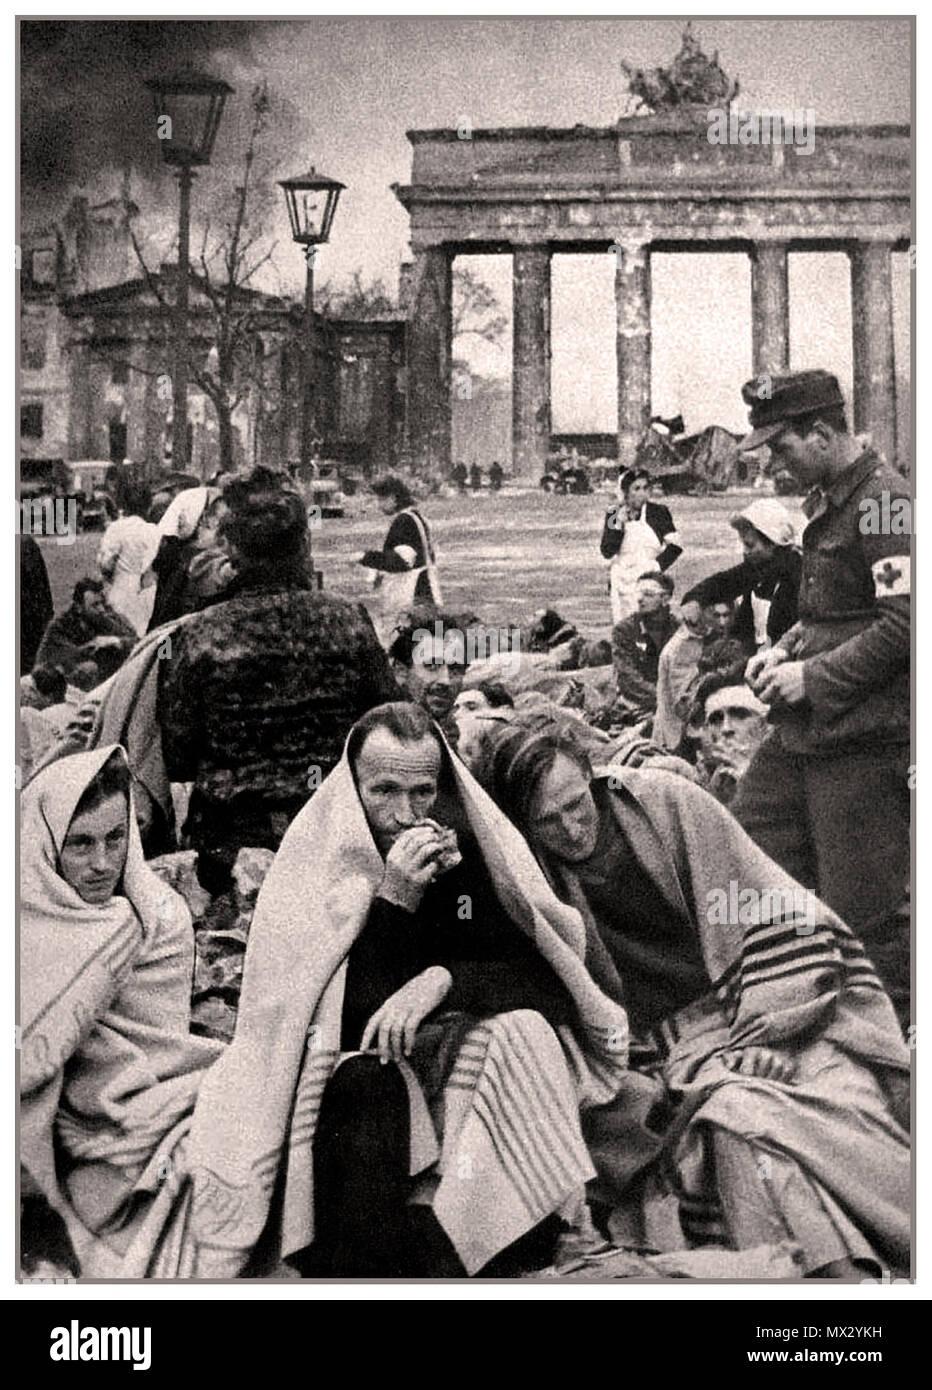 Vintage WW2 Brandenburg Gate Berlin with defeated Nazi German POWs and medics 1945 - Stock Image